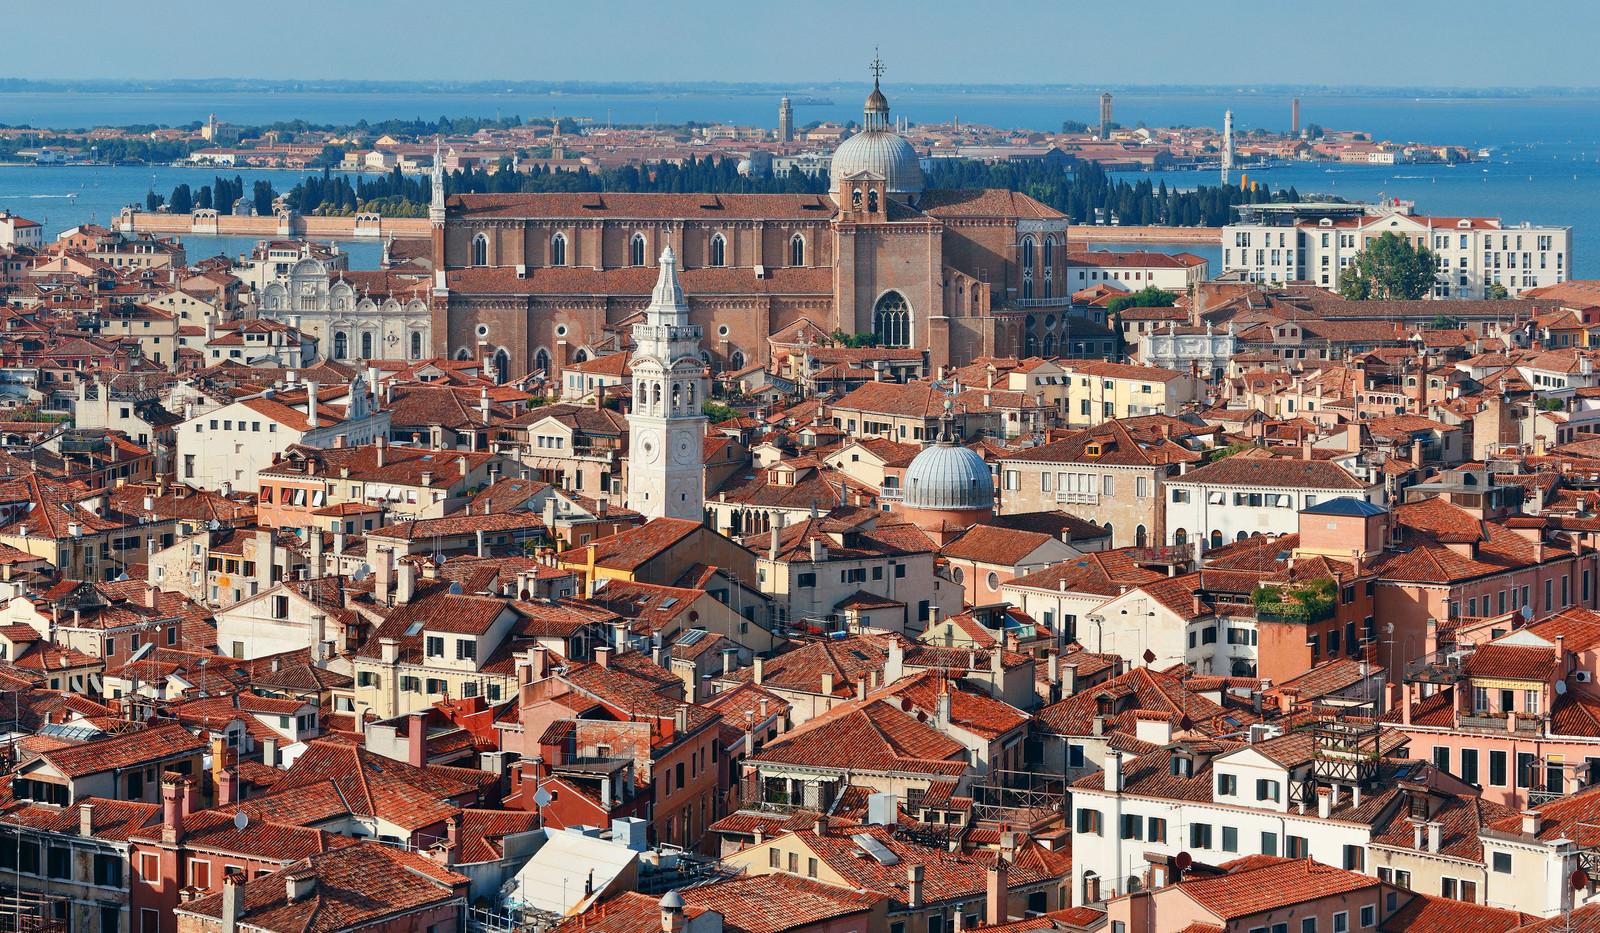 Canva - Venice Skyline View.jpg